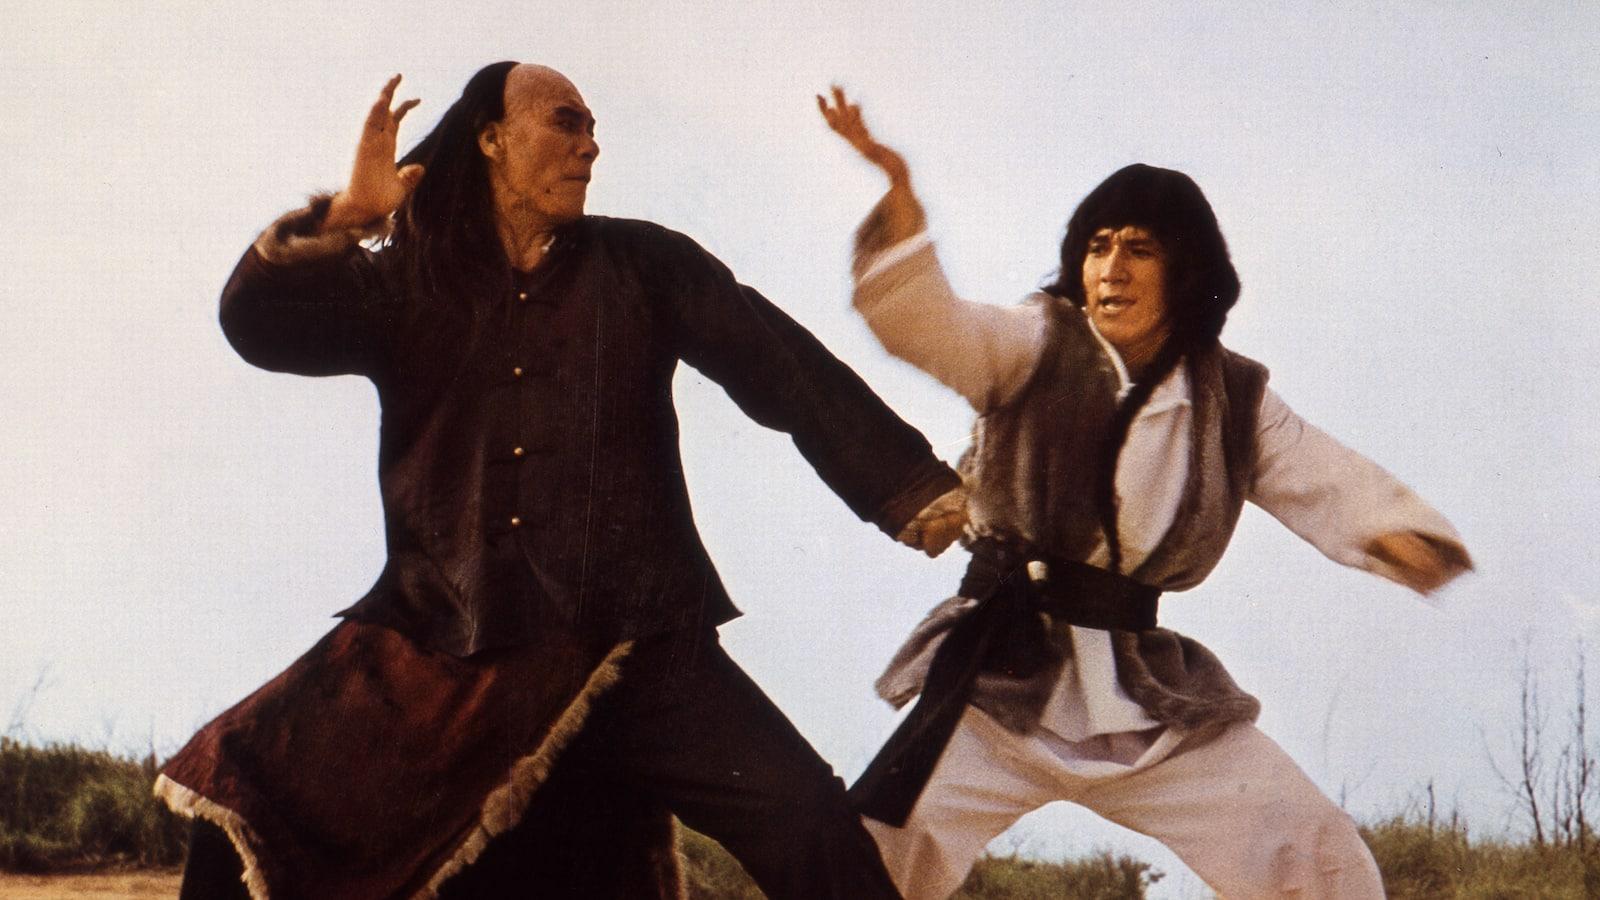 snake-and-crane-arts-of-shaolin-1978